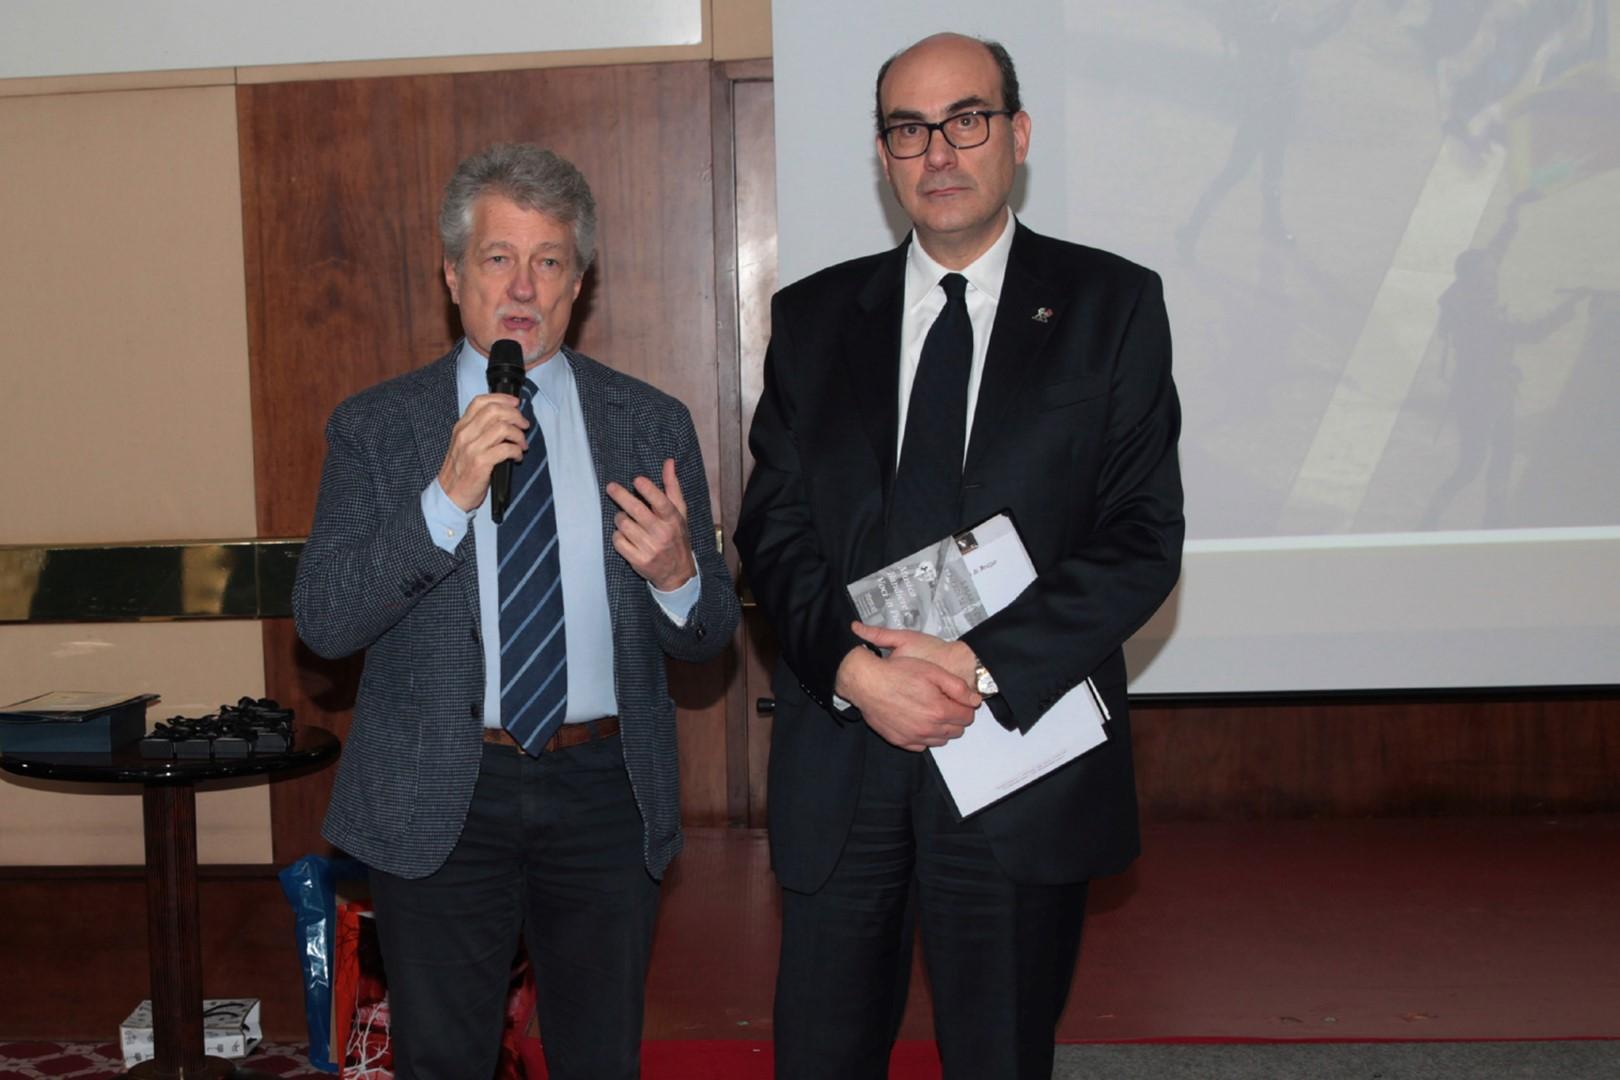 Cena Sbandieratori_Rogialli (4)